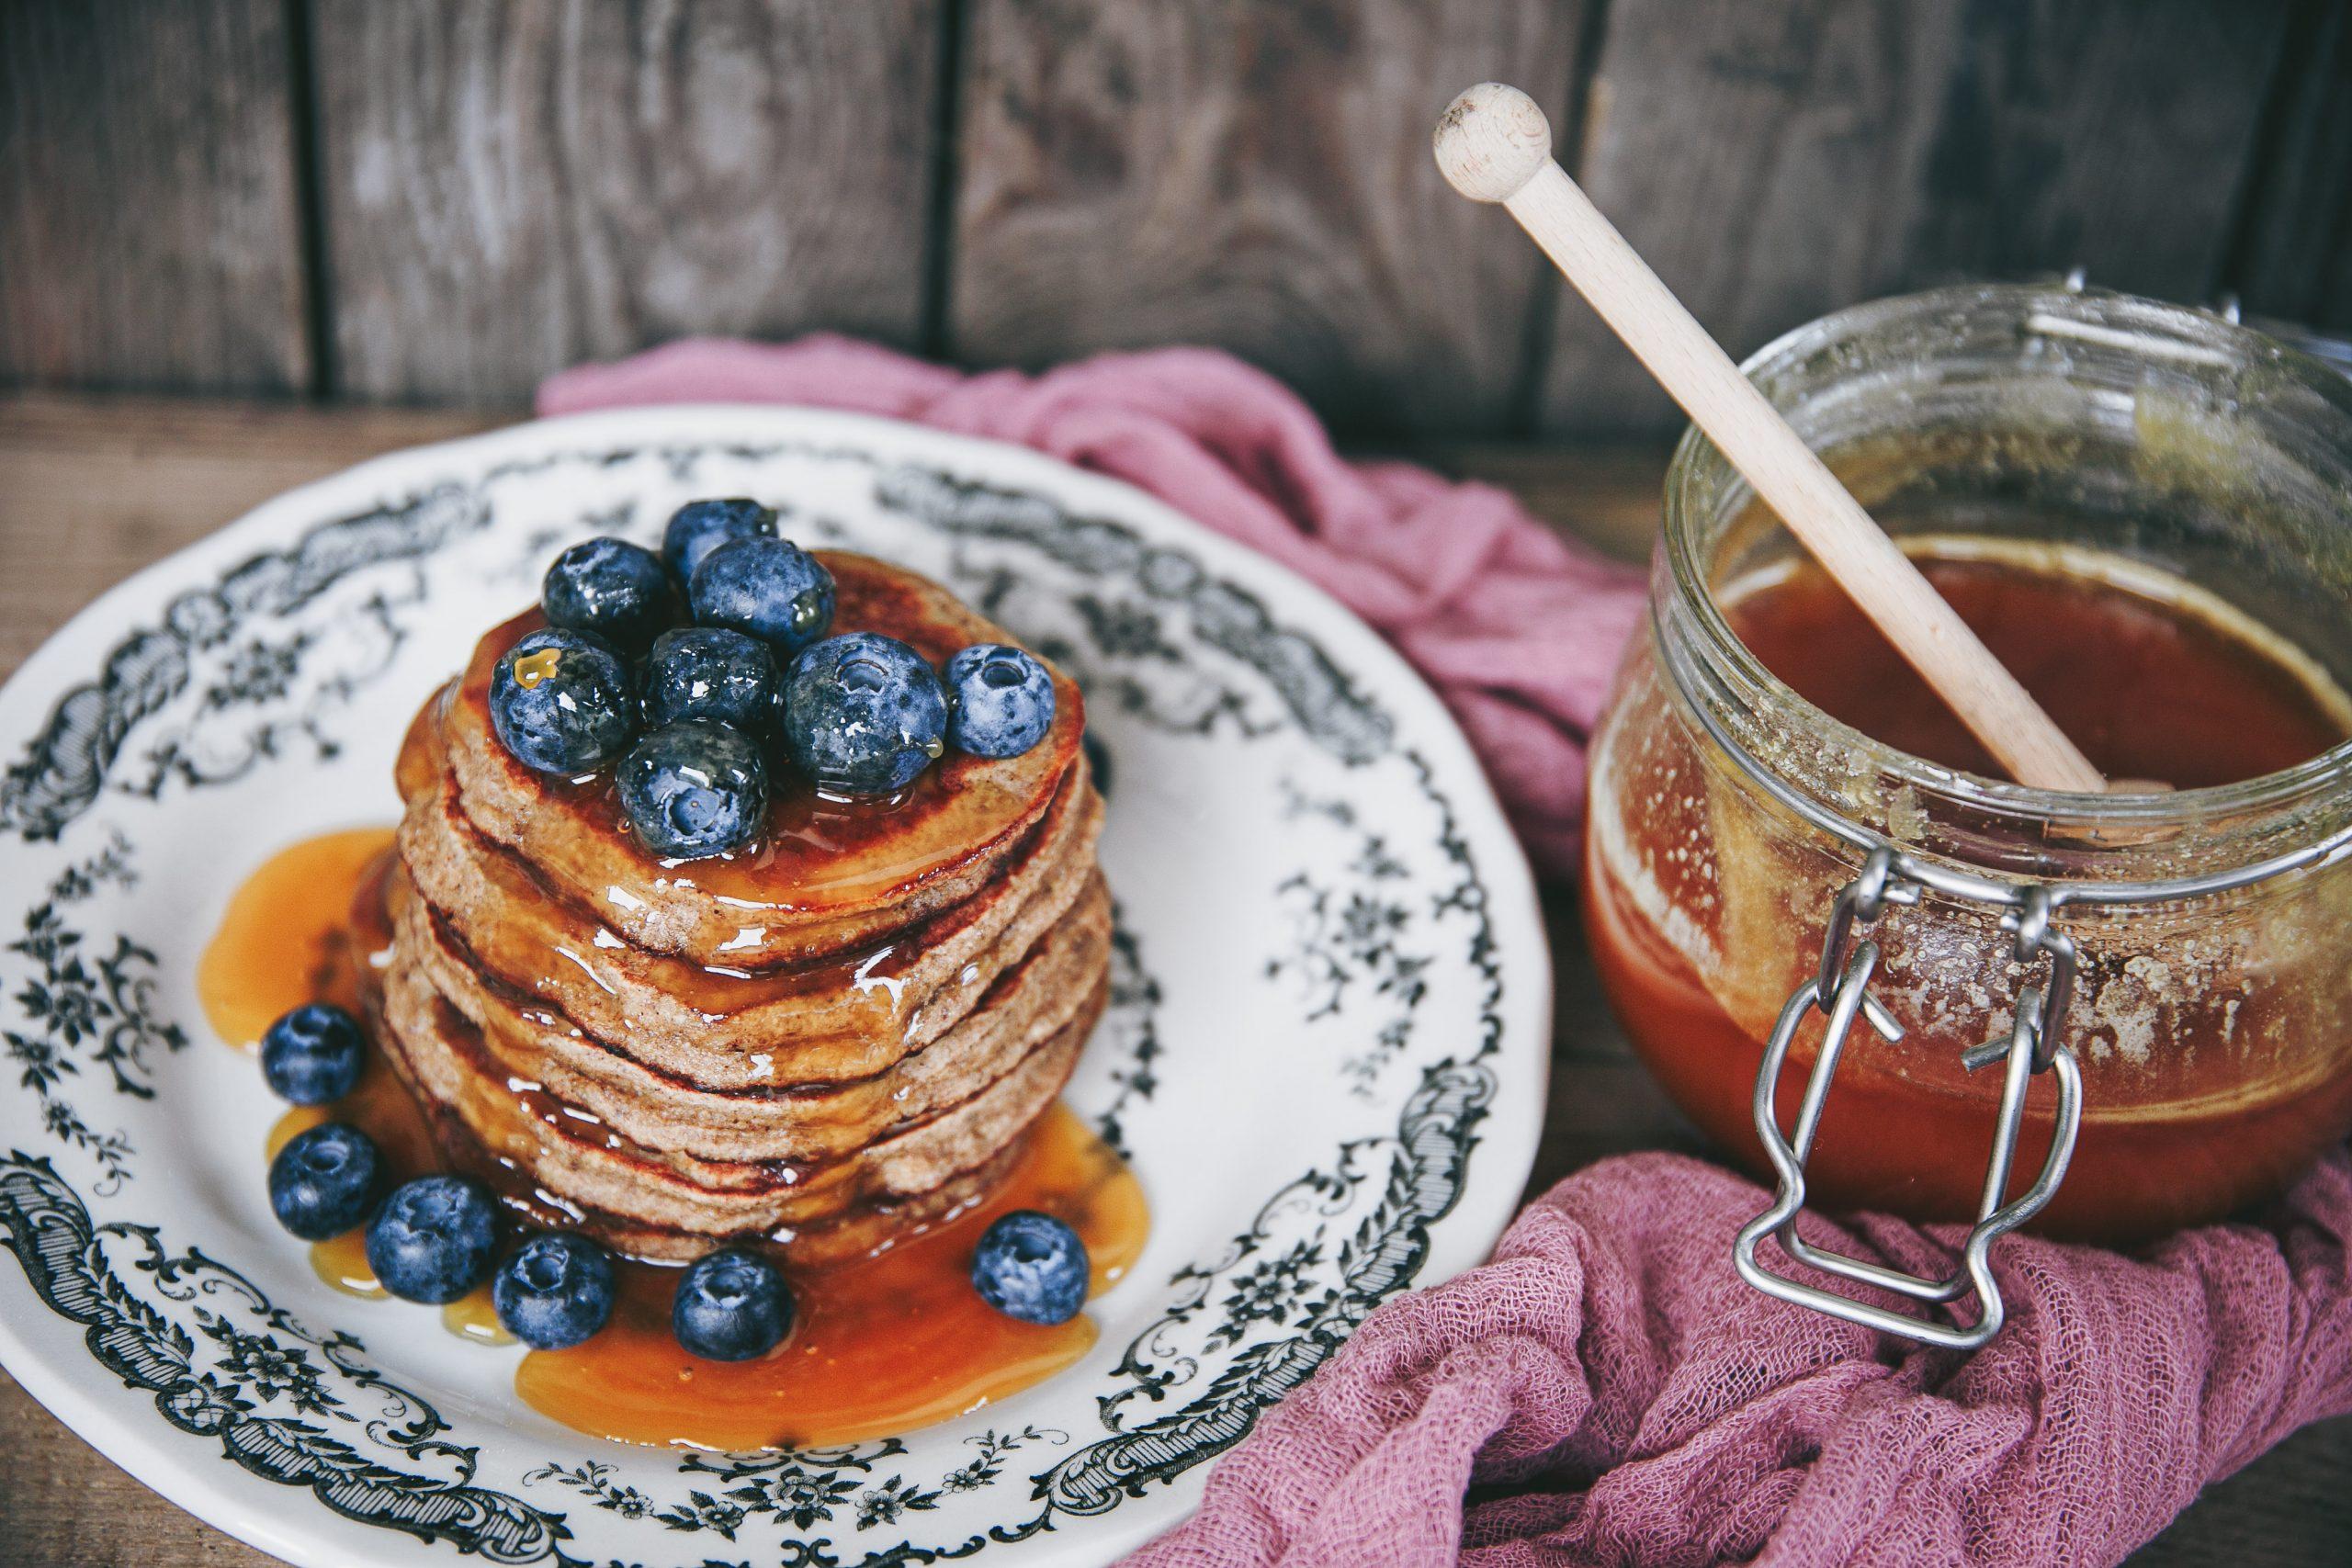 The Ultimate Banana Pancakes (Gluten Free, Dairy Free, Vegan) on The Adagio Blog by Thais FK